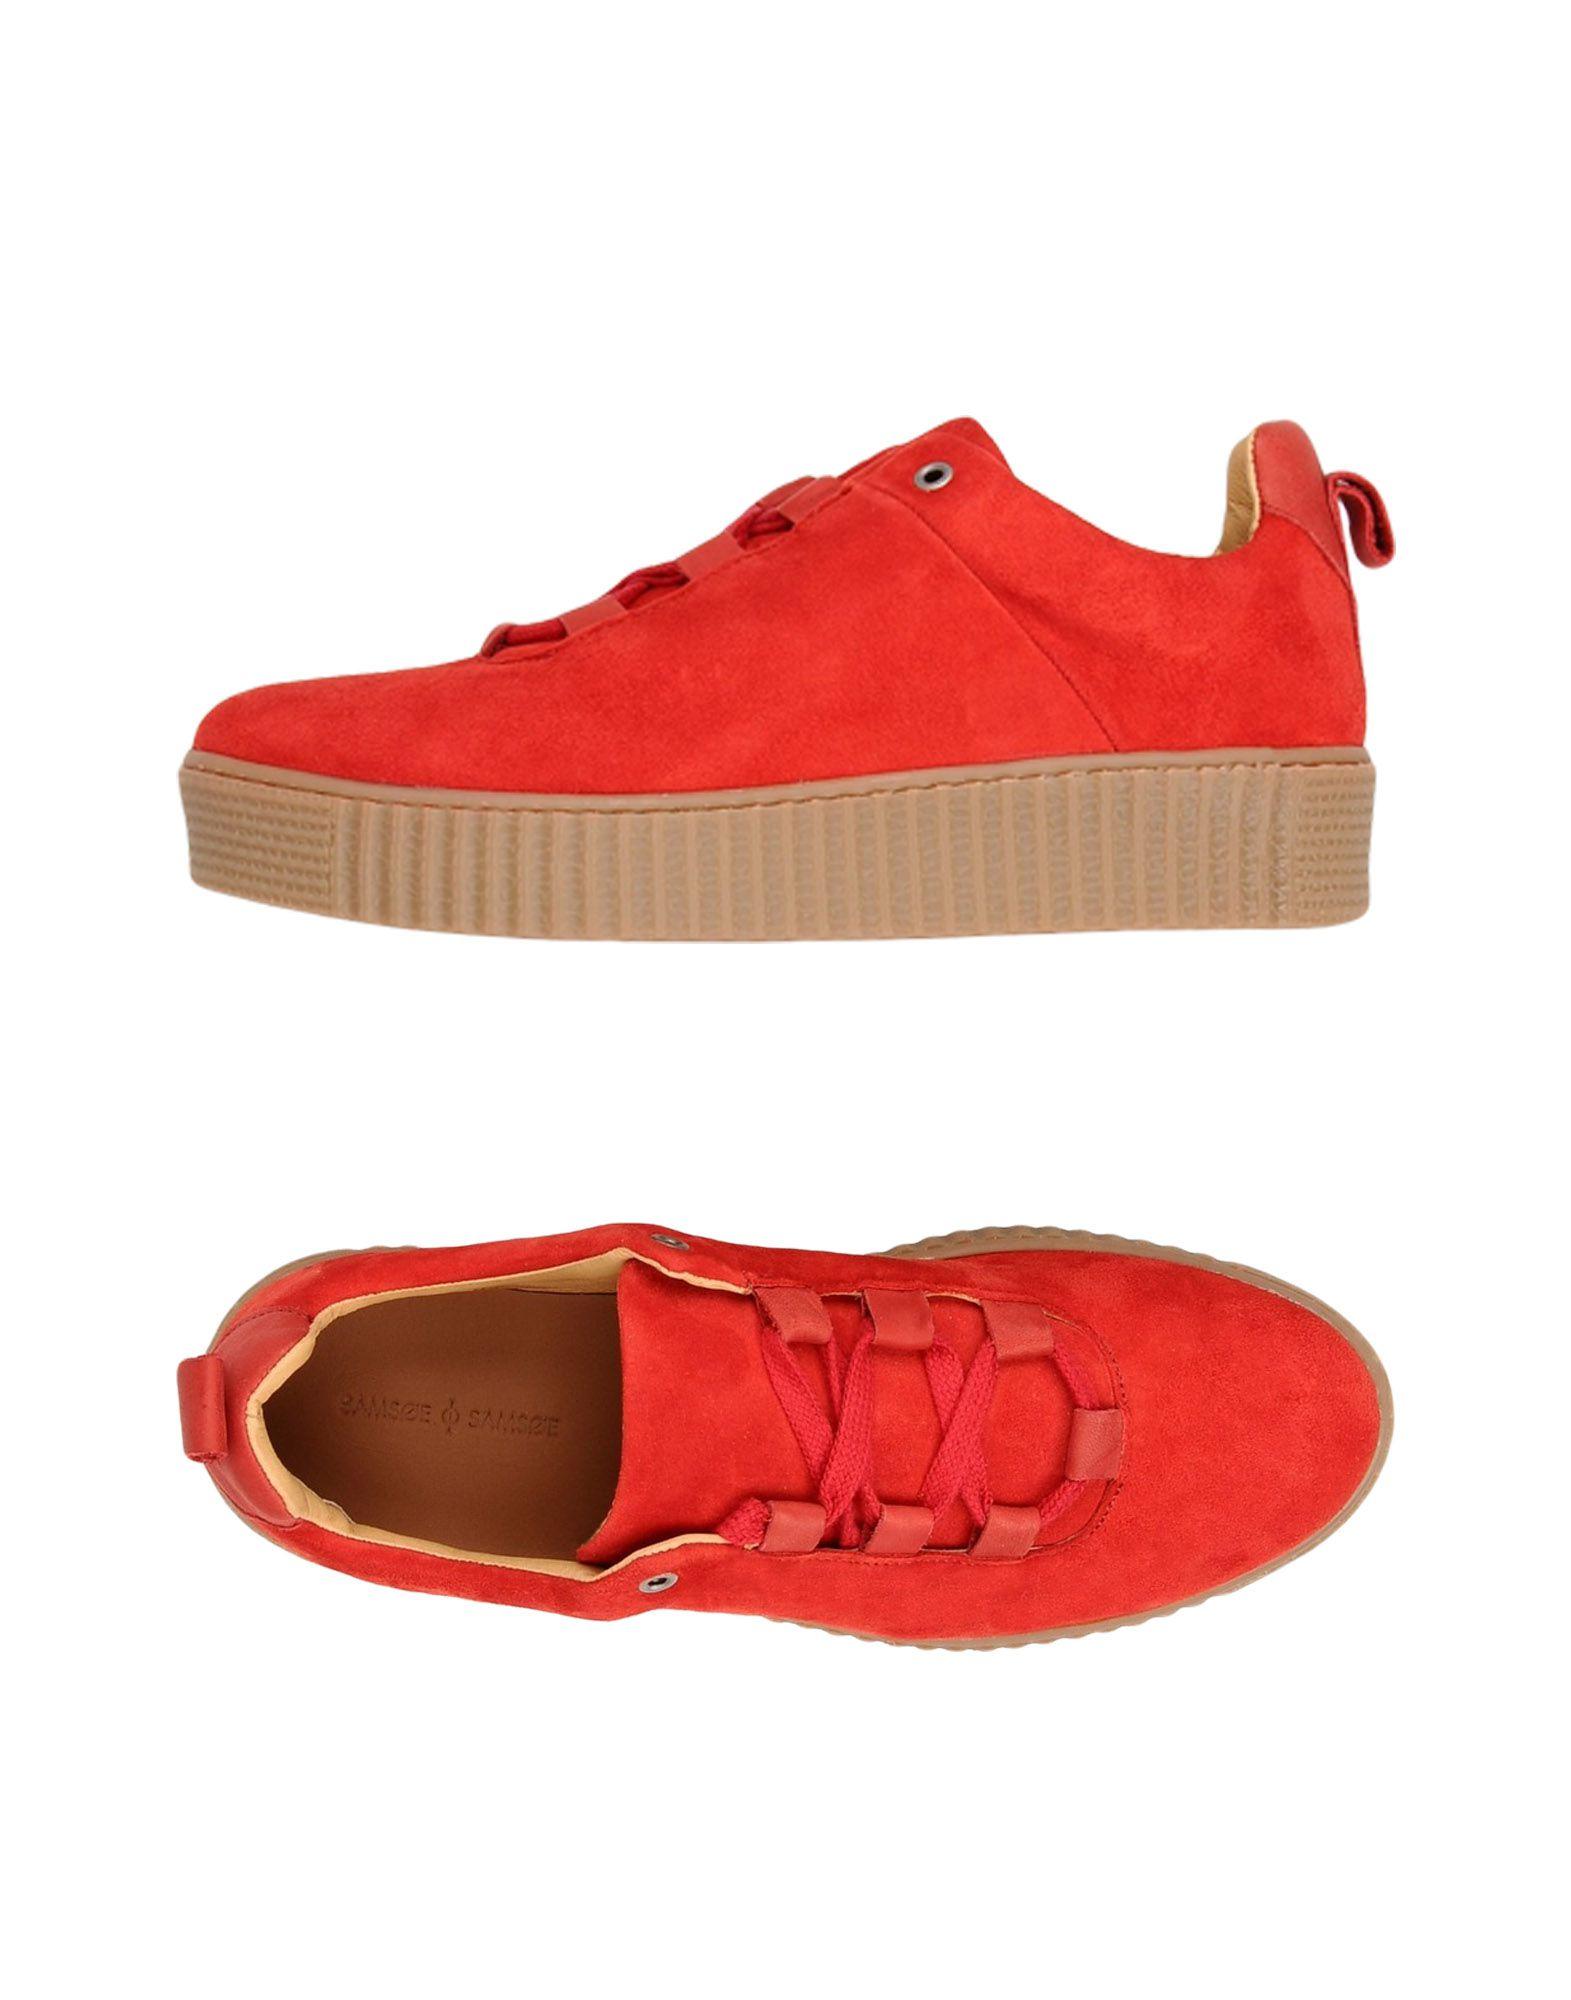 Stilvolle Samsøe billige Schuhe Samsøe Φ Samsøe Stilvolle Sneakers Damen  11318724FJ ae9a56